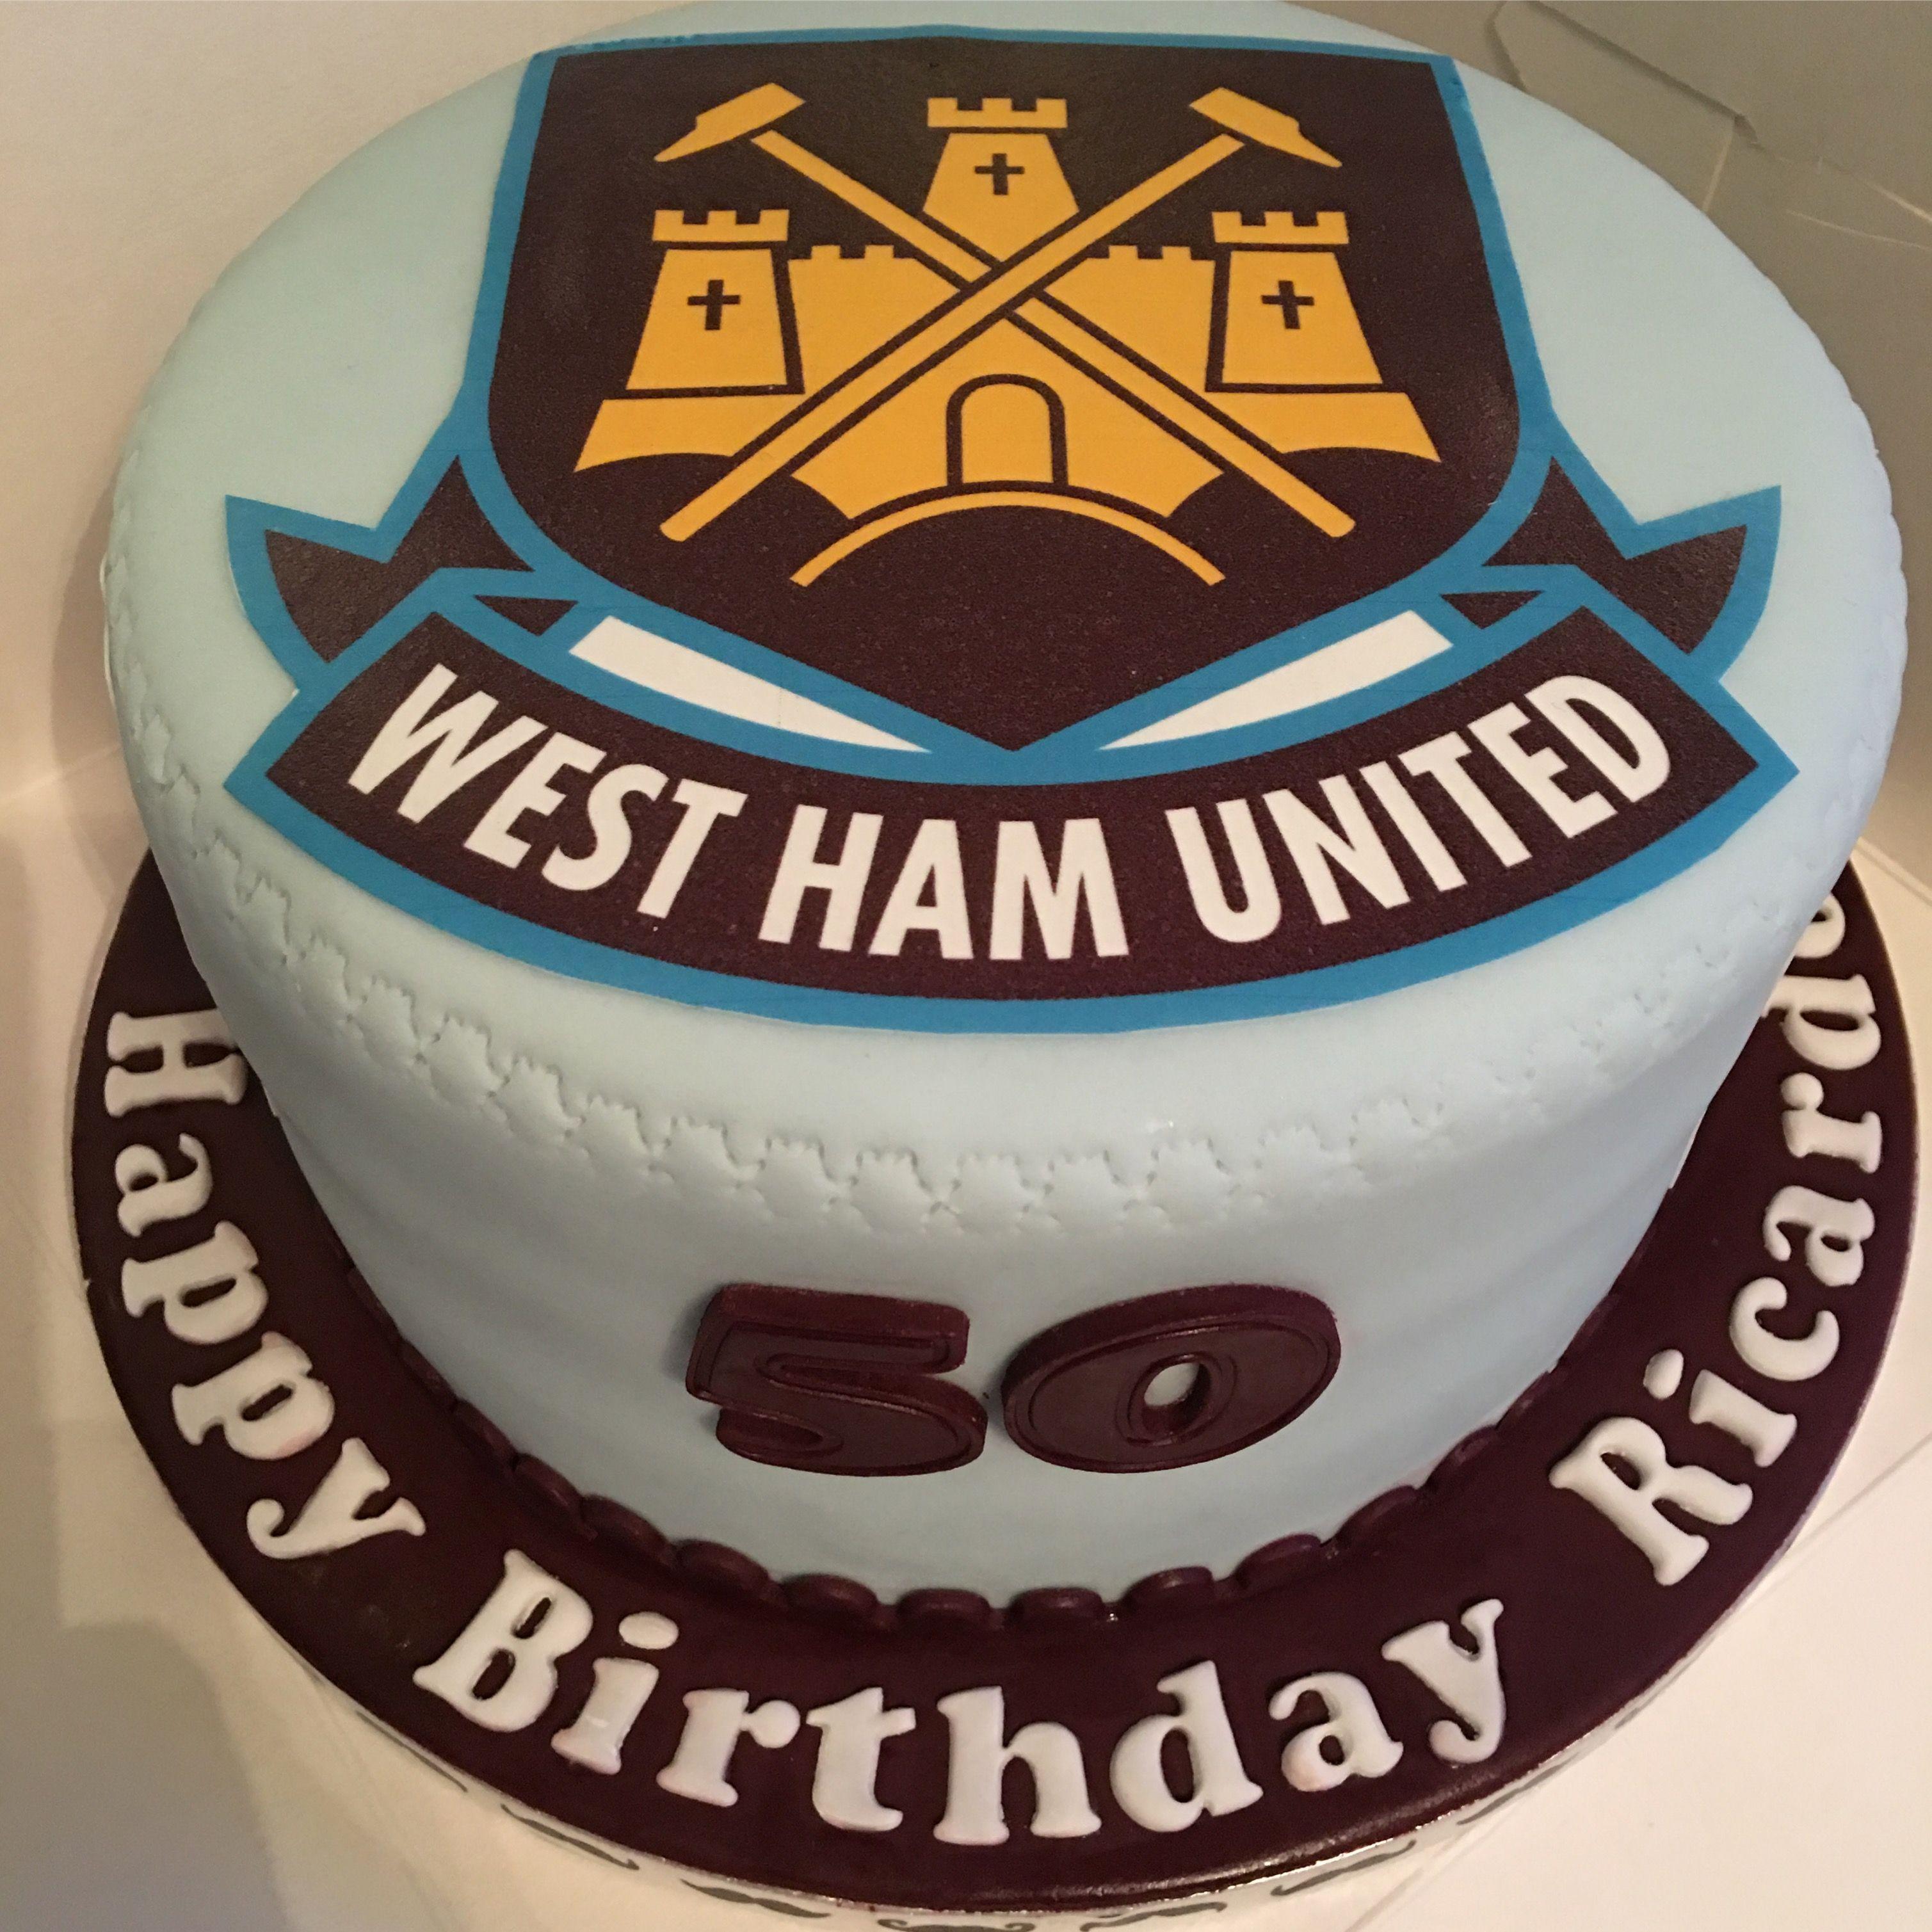 West Ham United Vanilla Cake Cake West Ham Vanilla Cake